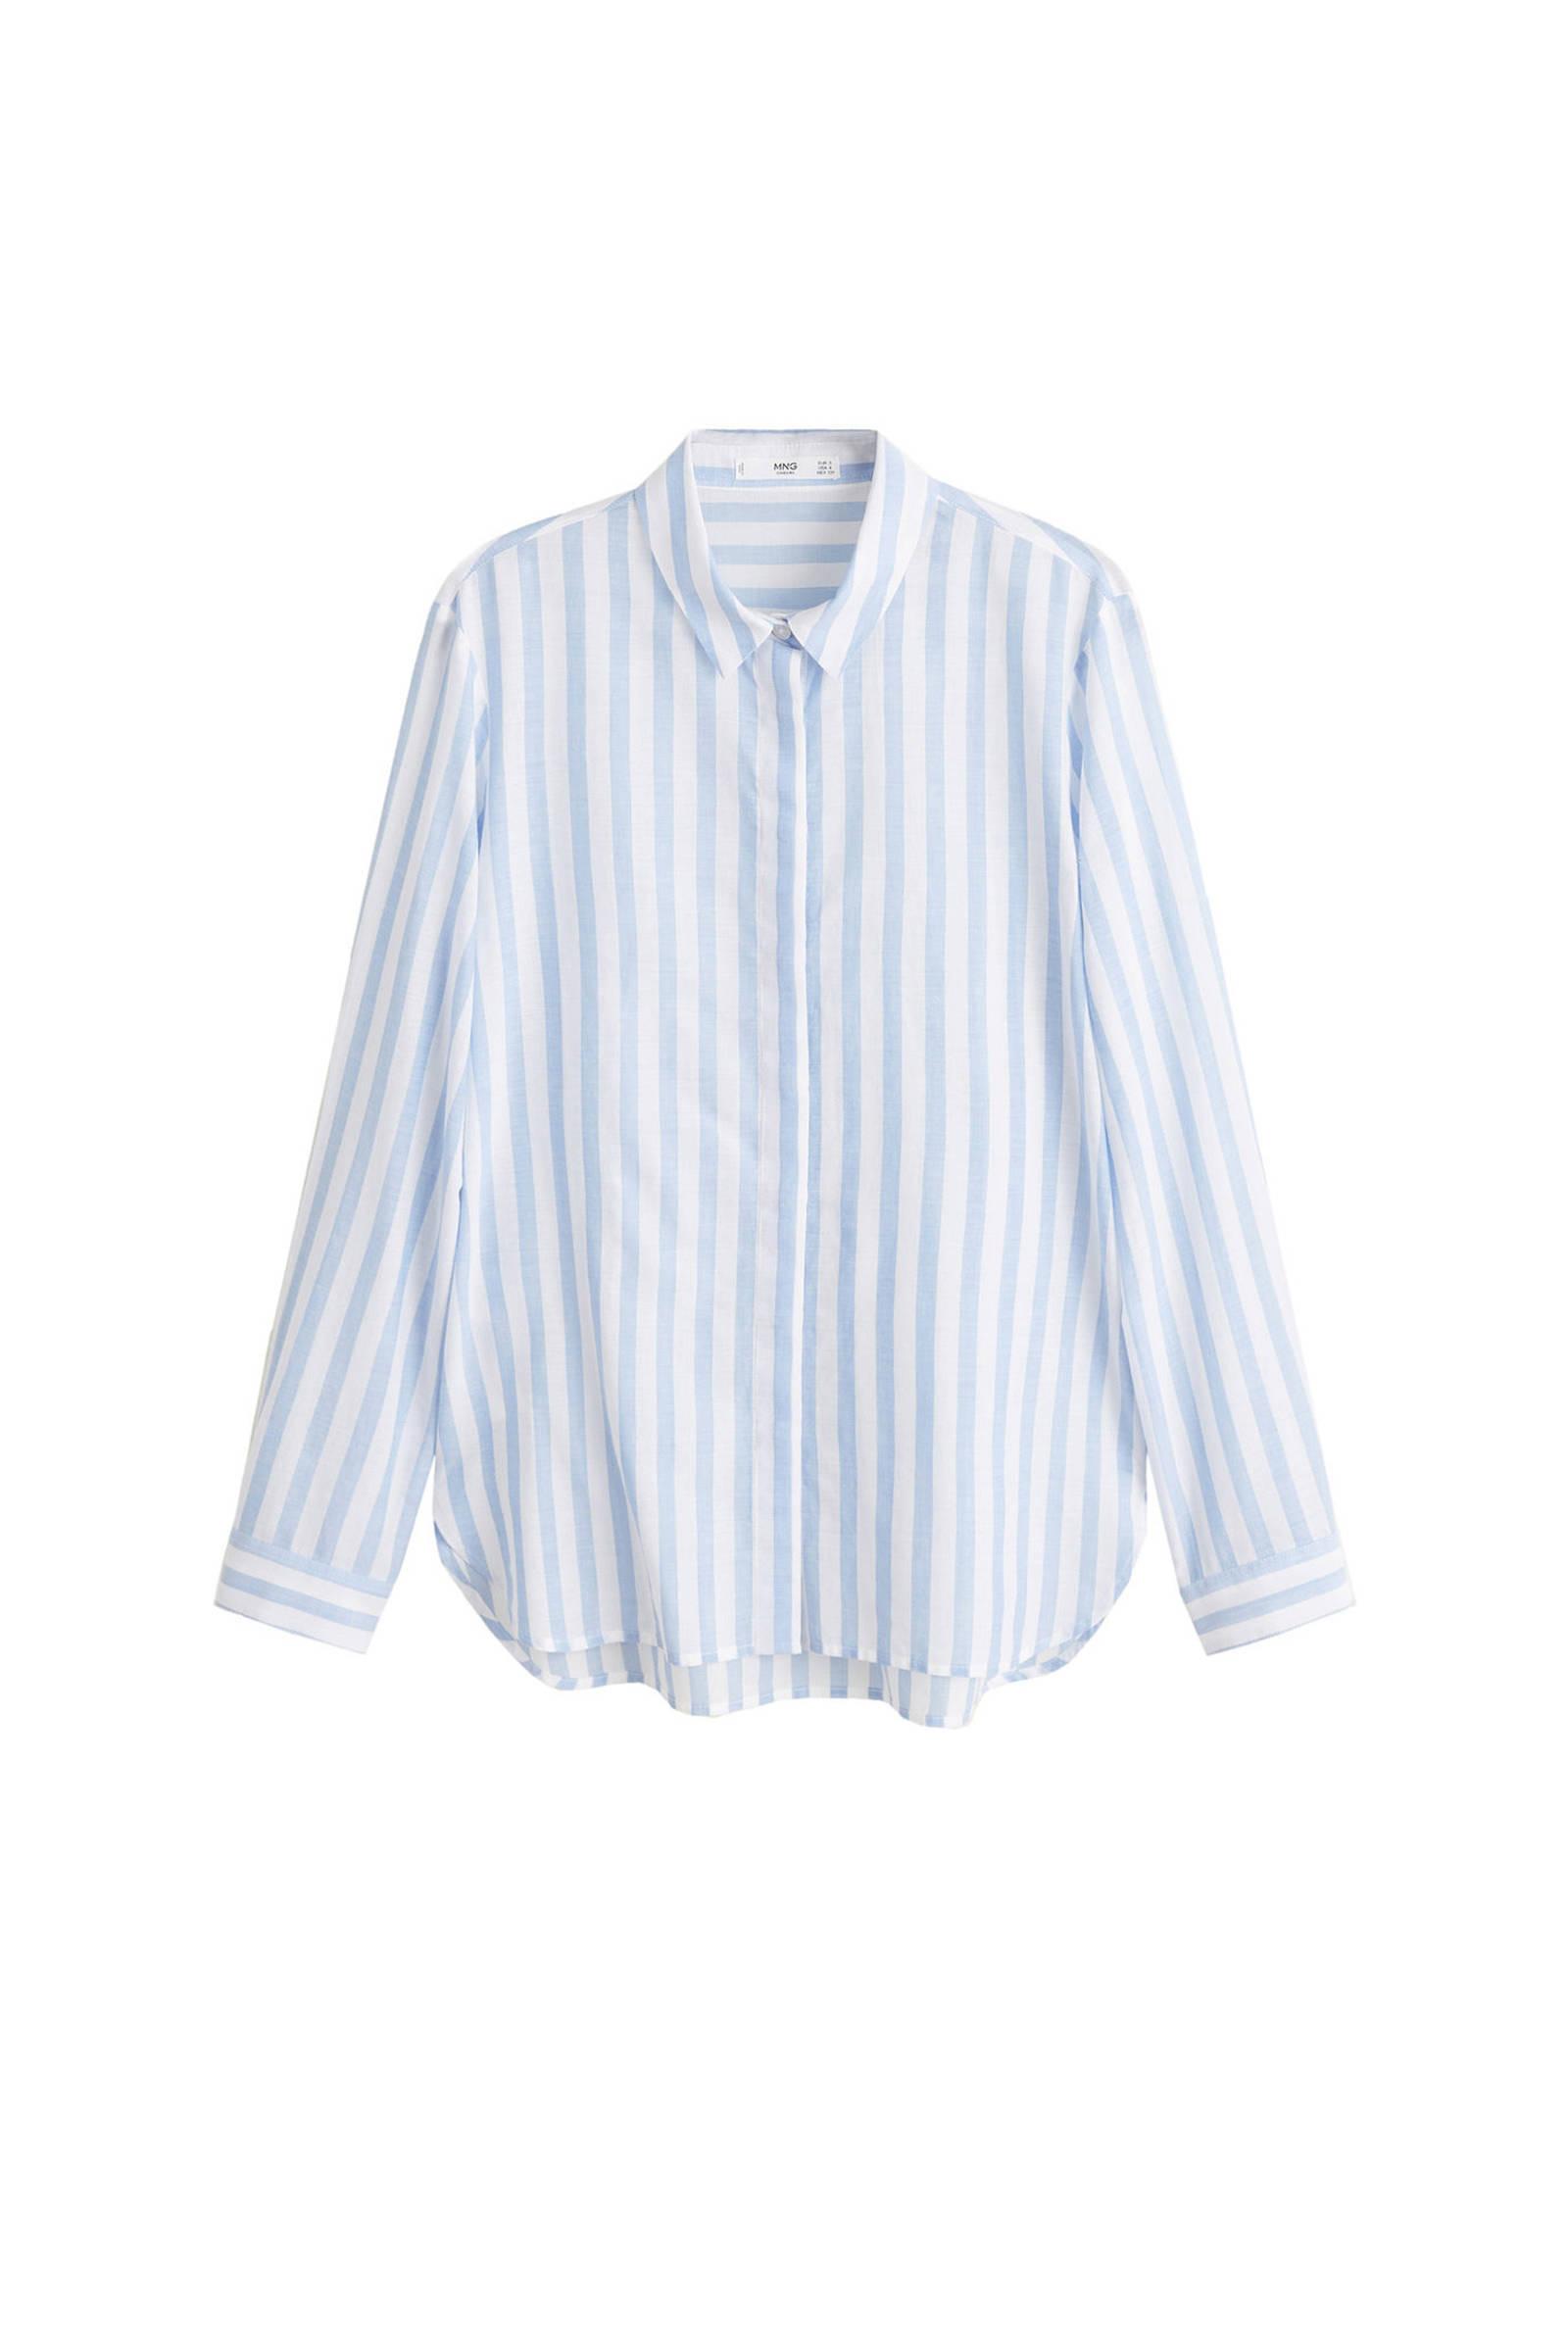 witte blouse met roesjes